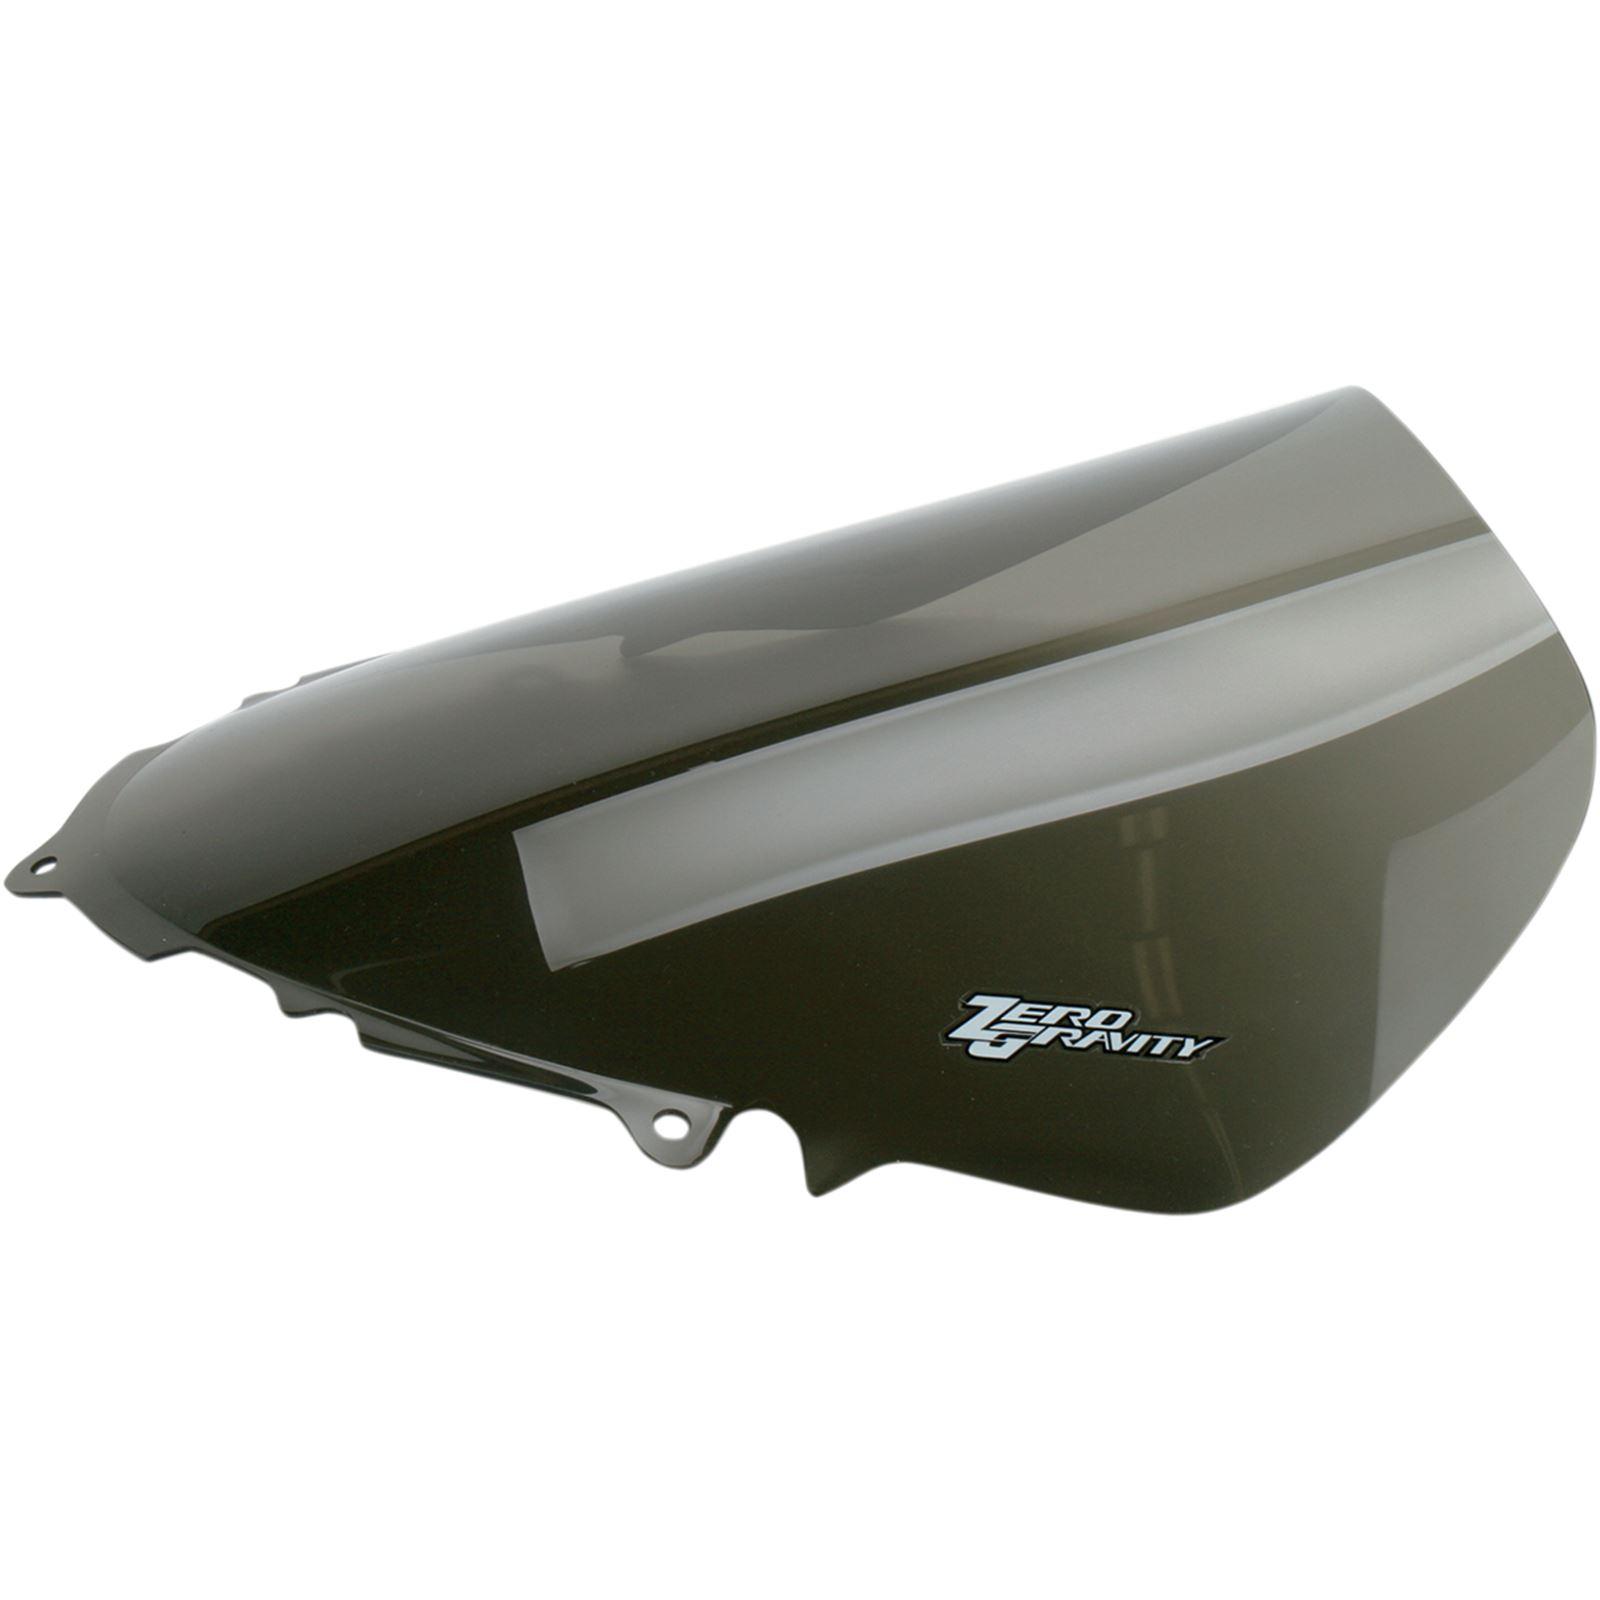 Zero Gravity Windshields Sport Winsdscreen - Smoke - 600/750